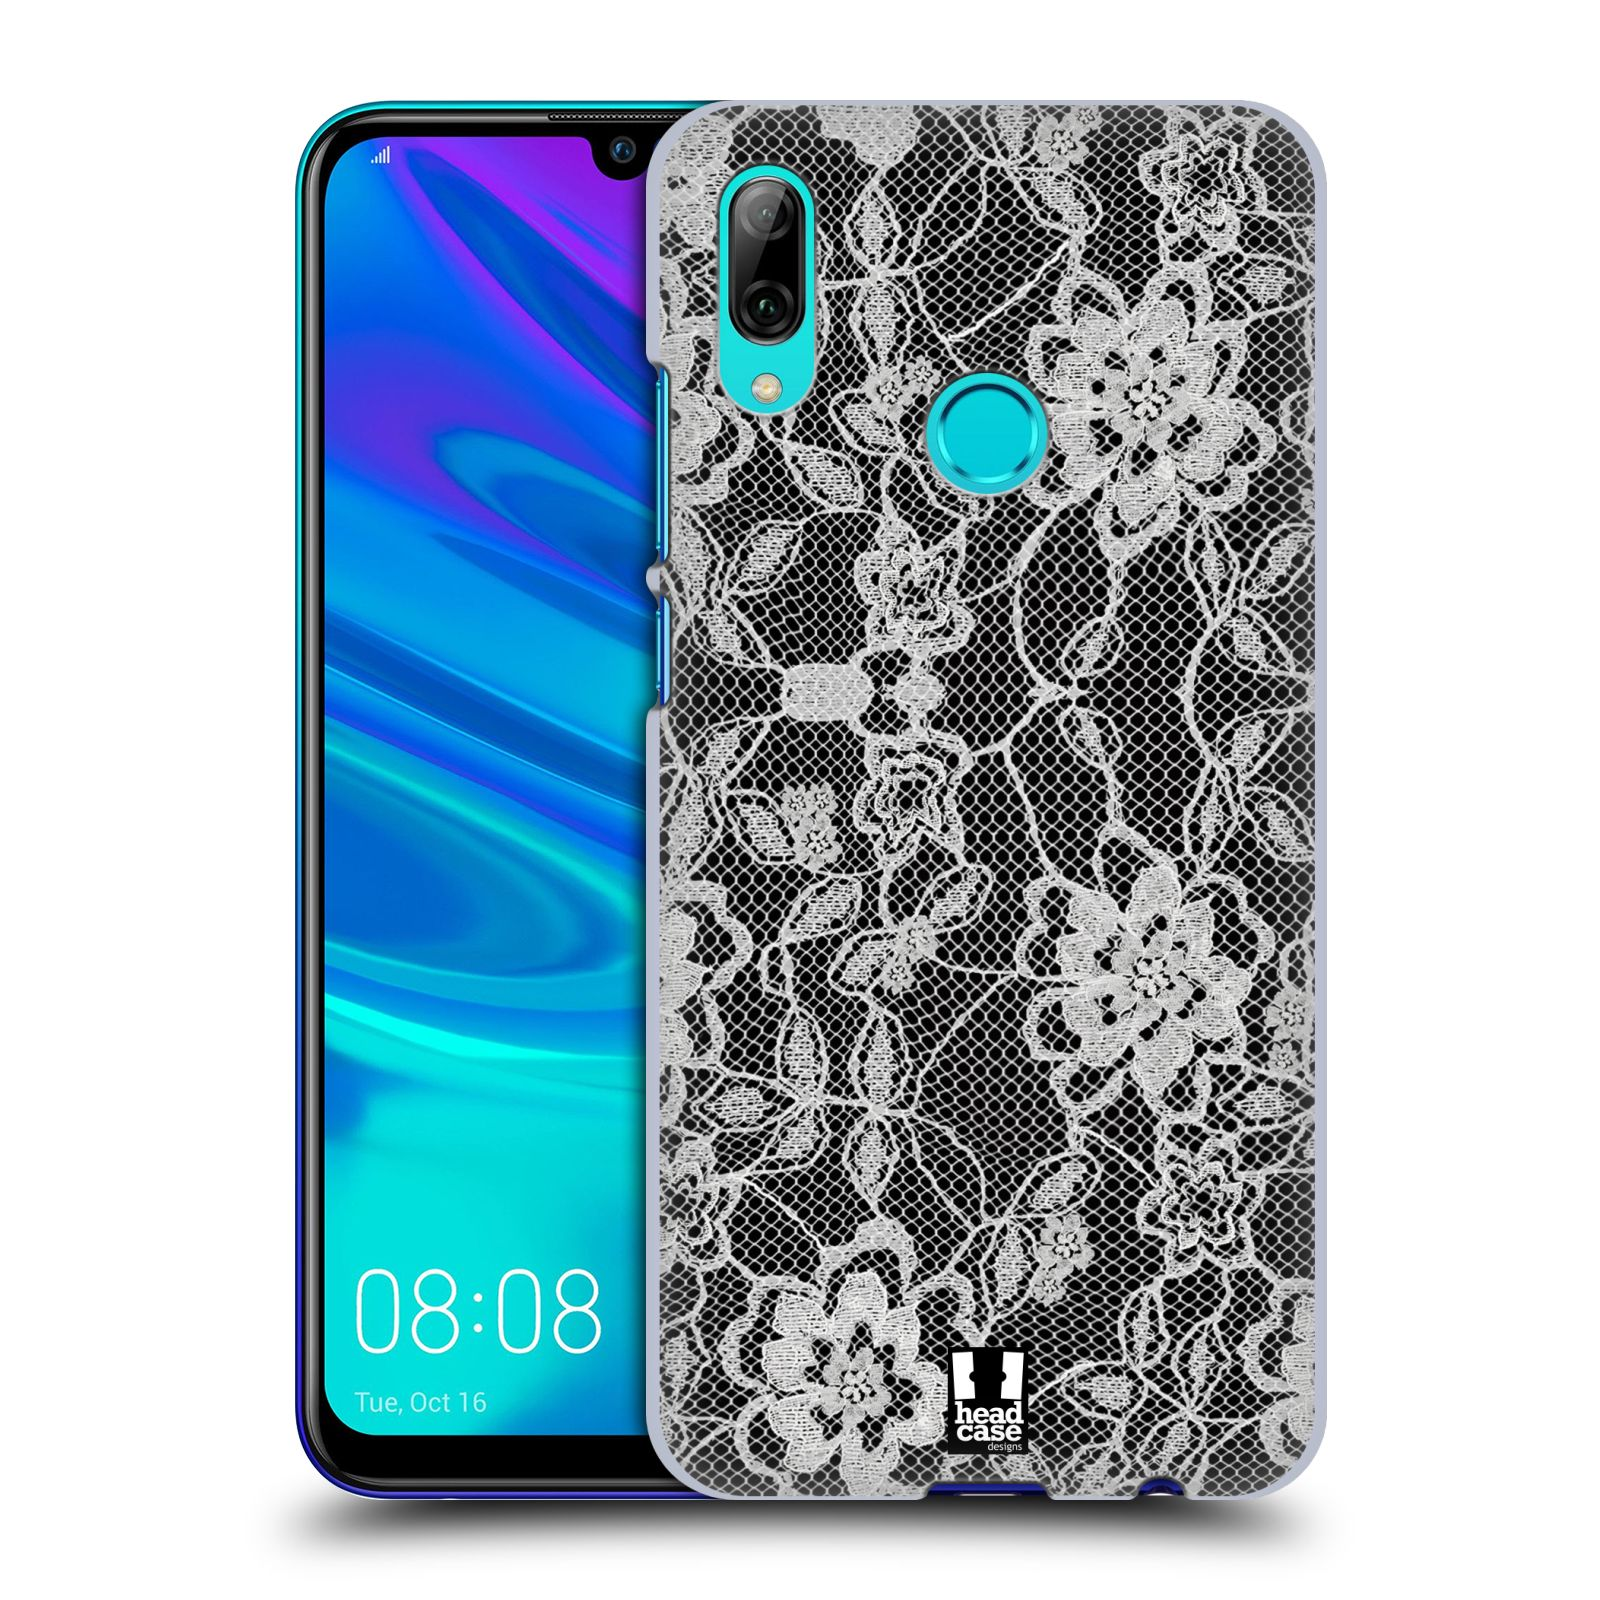 Plastové pouzdro na mobil Huawei P Smart (2019) - Head Case - FLOWERY KRAJKA